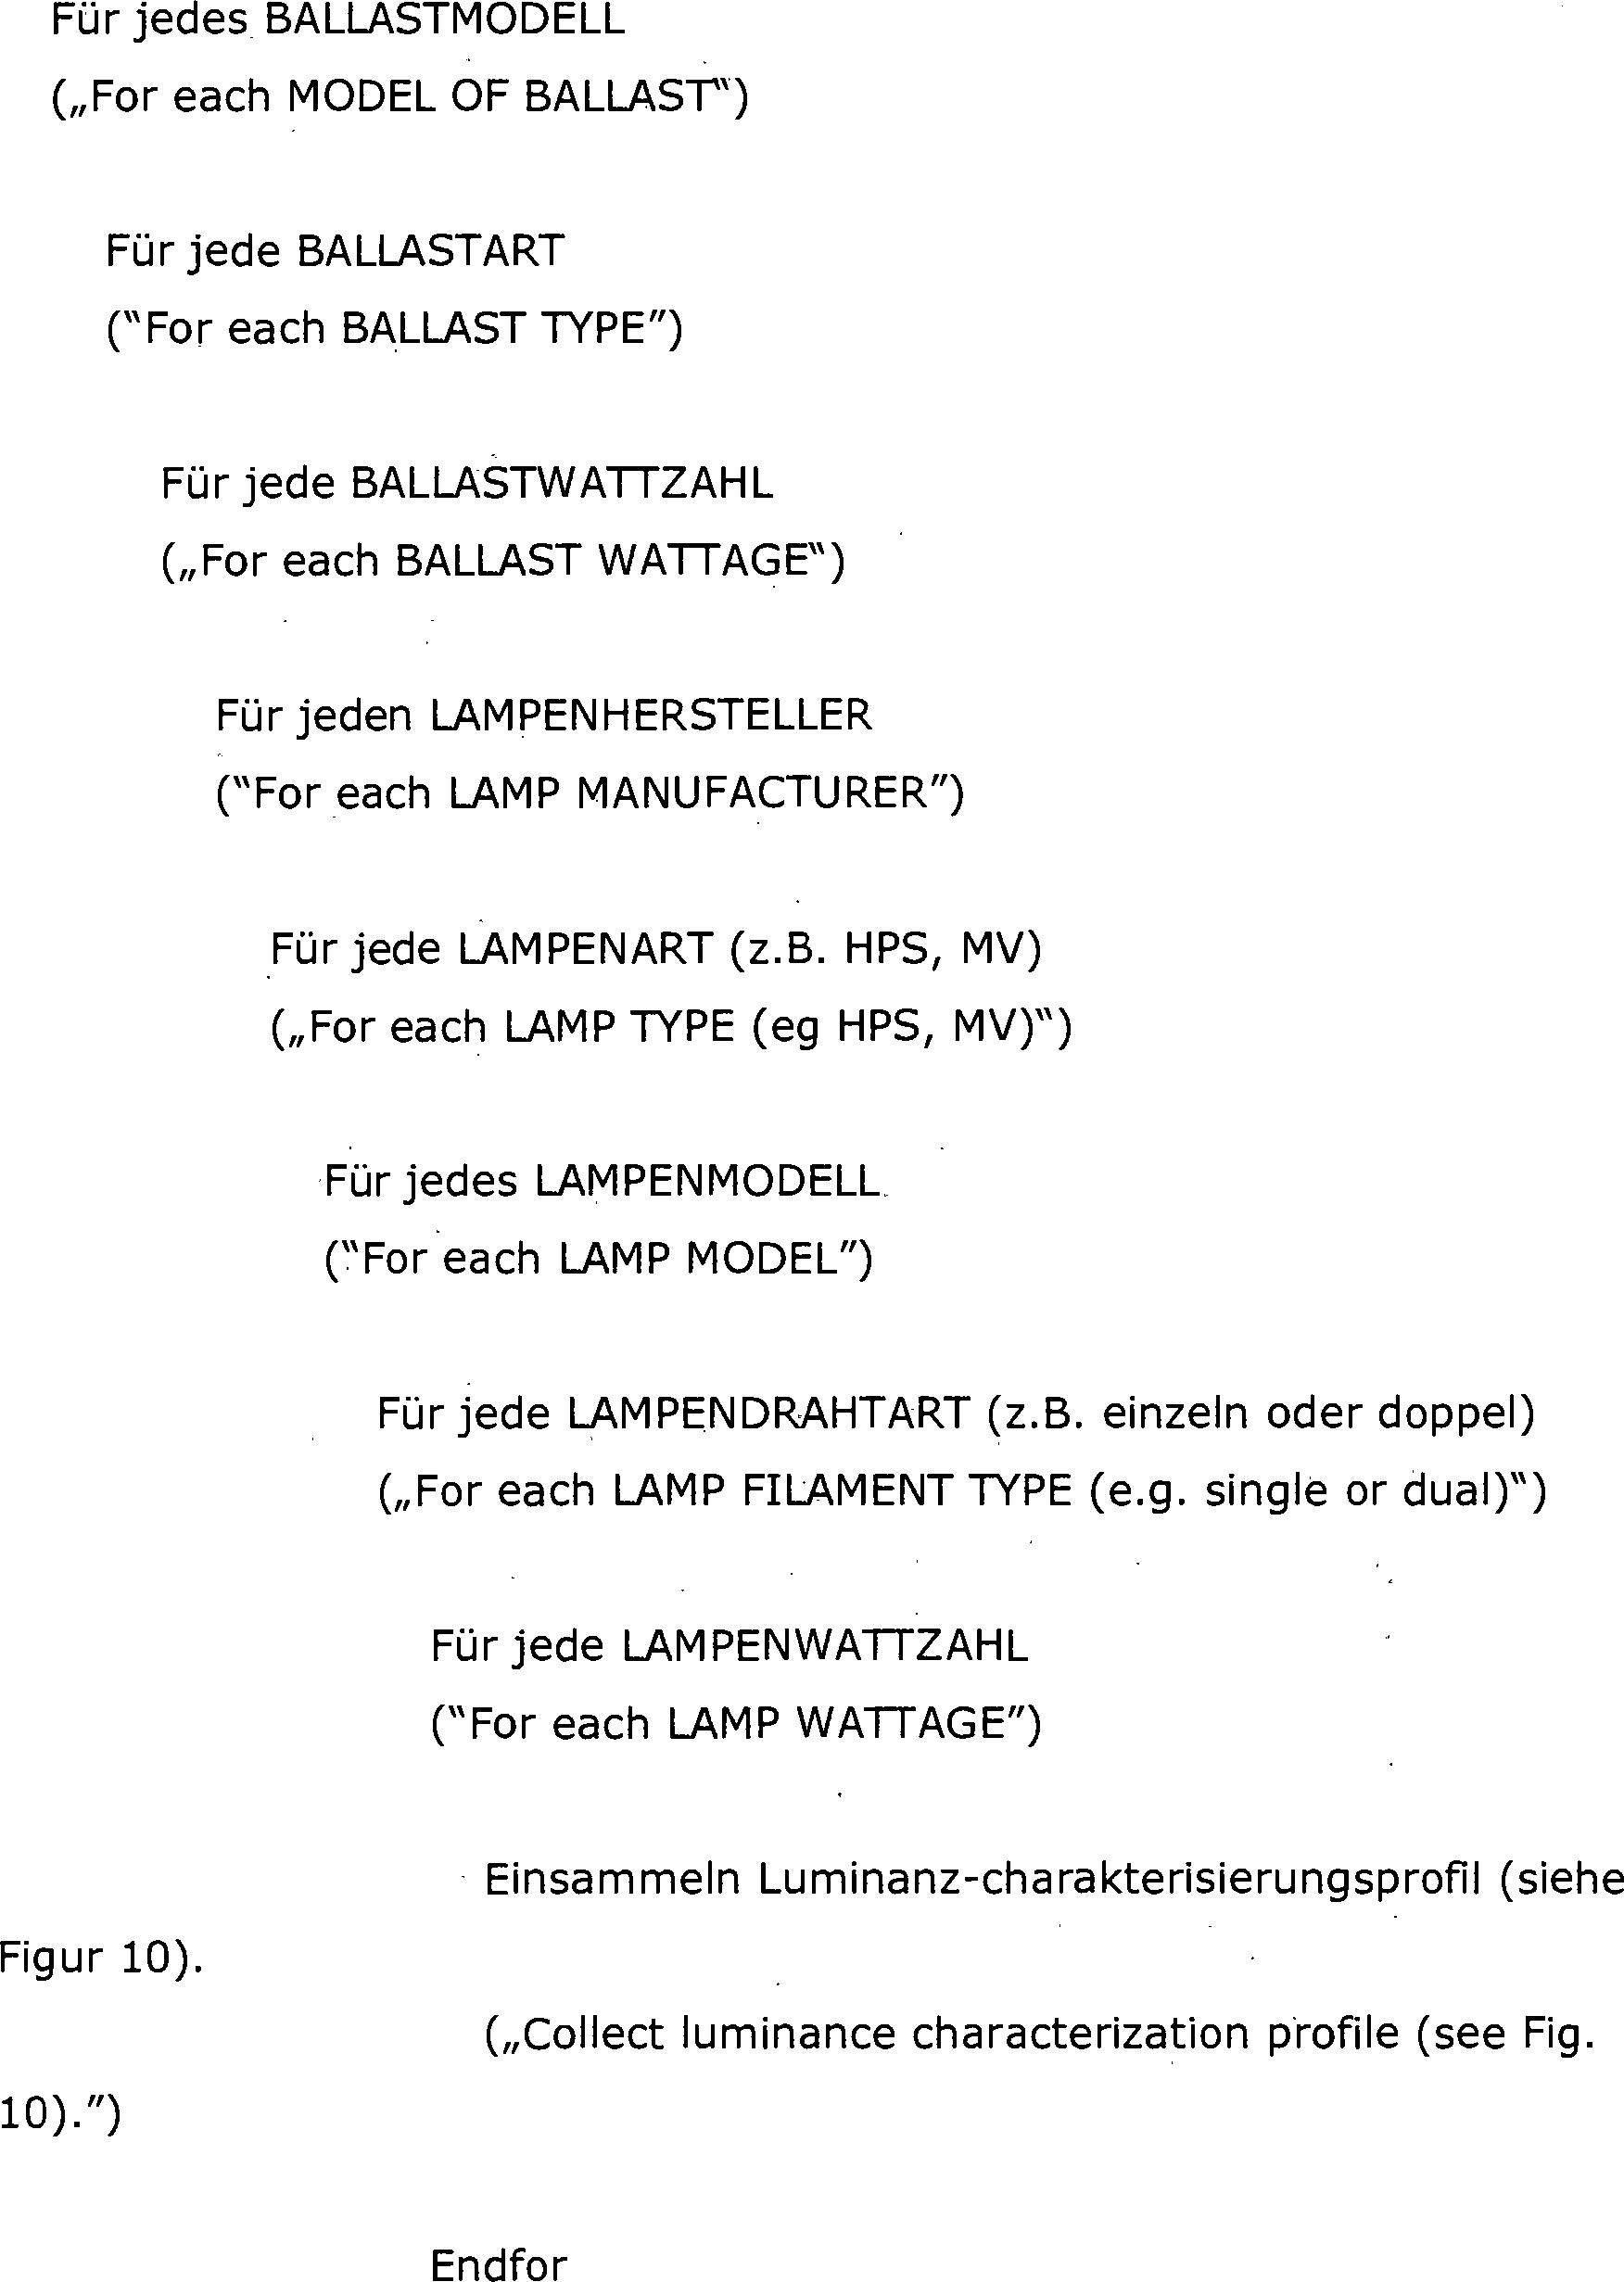 DE202006021104U1 - System for Luminanzcharakterisierung - Google Patents